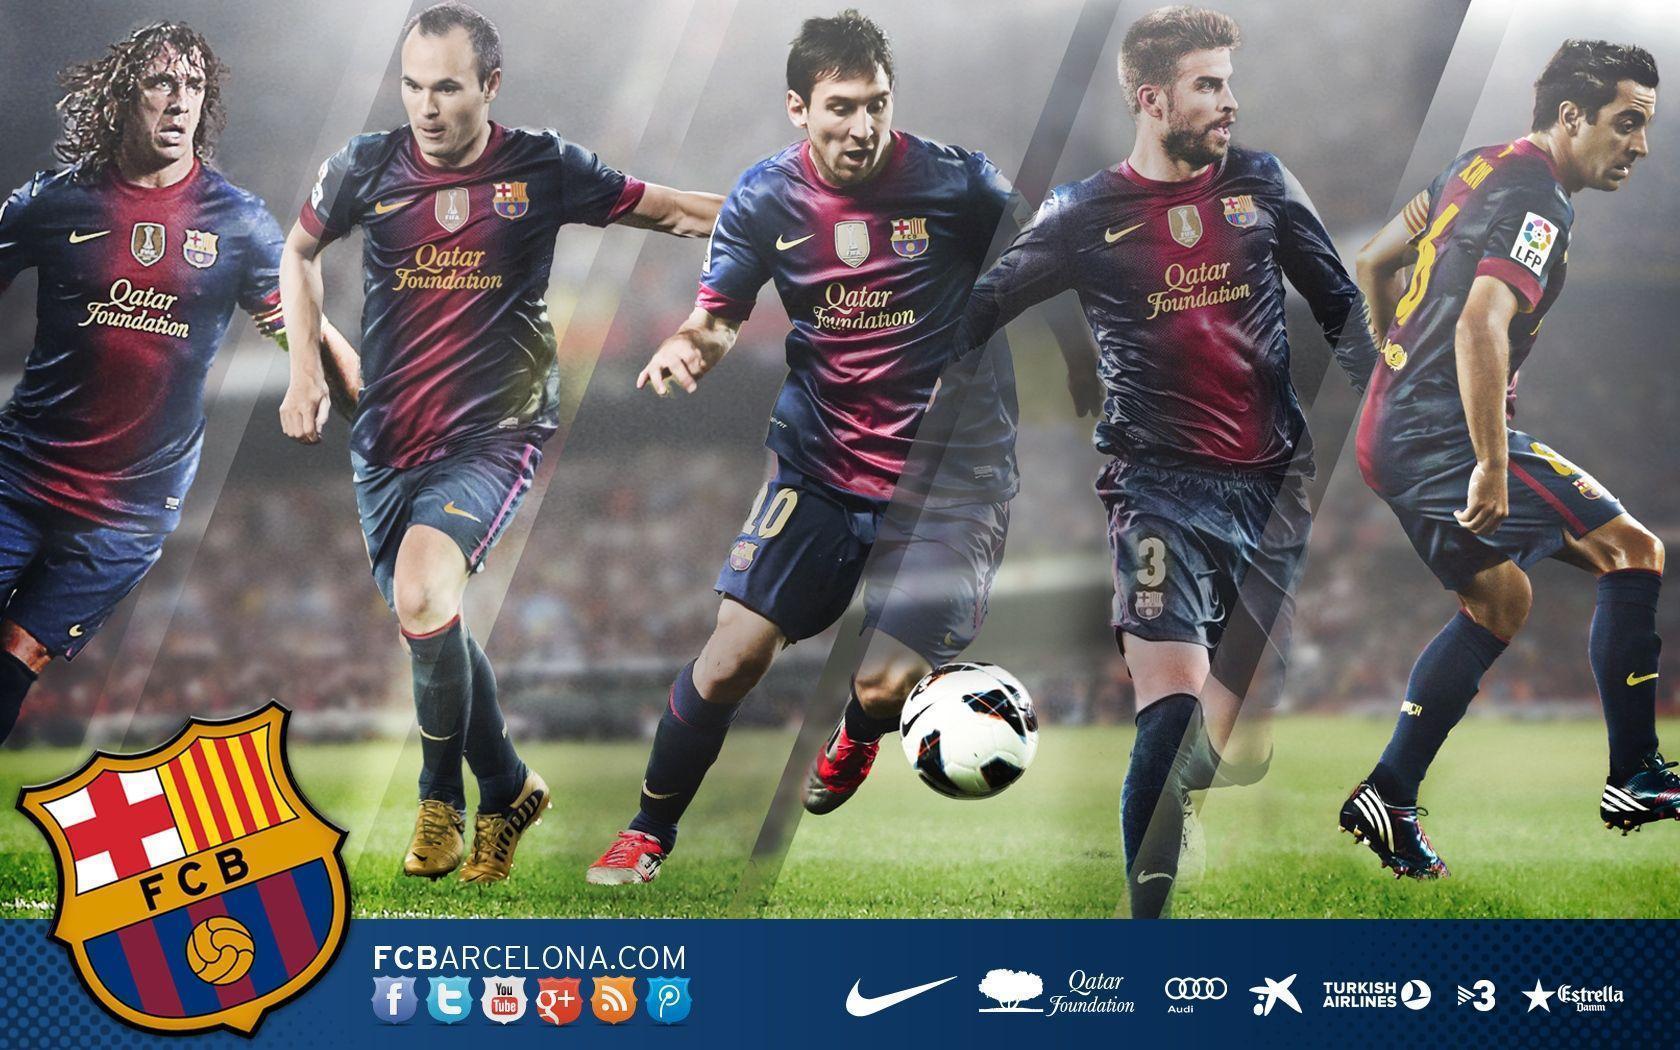 Fondos De Pantalla Del Fútbol Club Barcelona Wallpapers: FC Barcelona Team Wallpapers